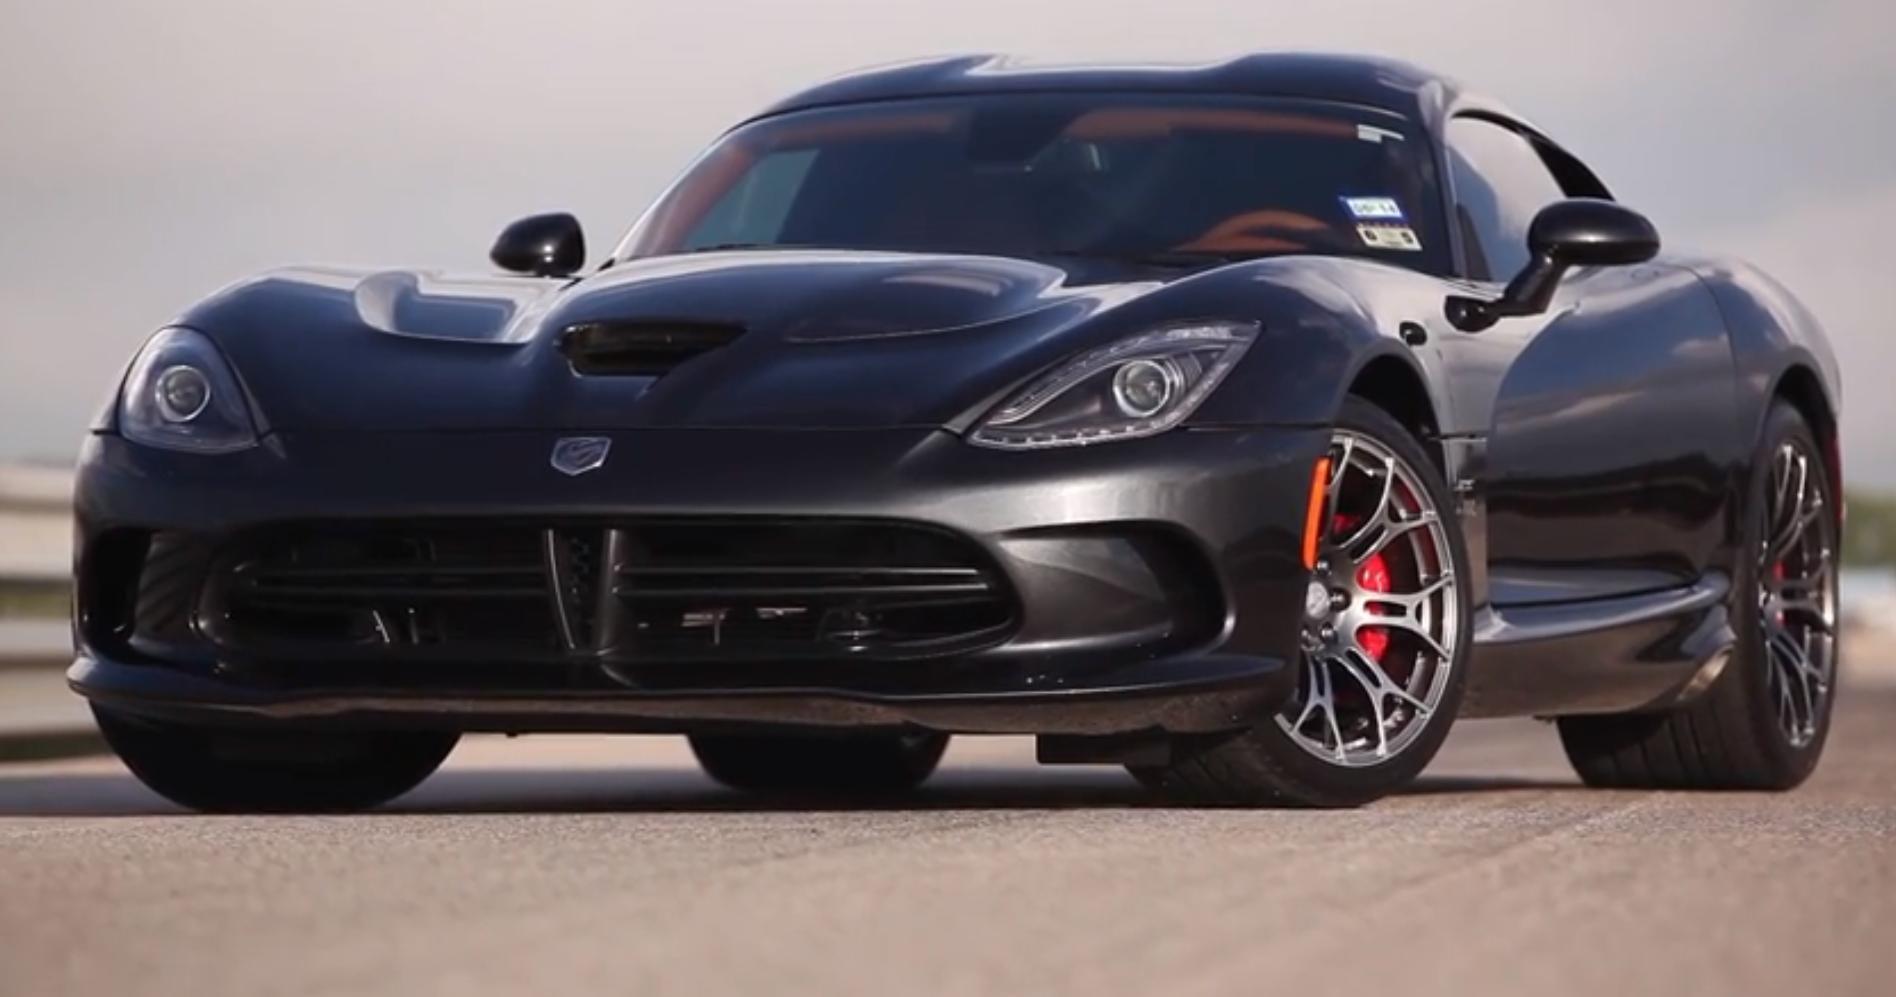 Dodge Viper 2015 Black   Cars   Pinterest   Dodge viper, Viper and Cars